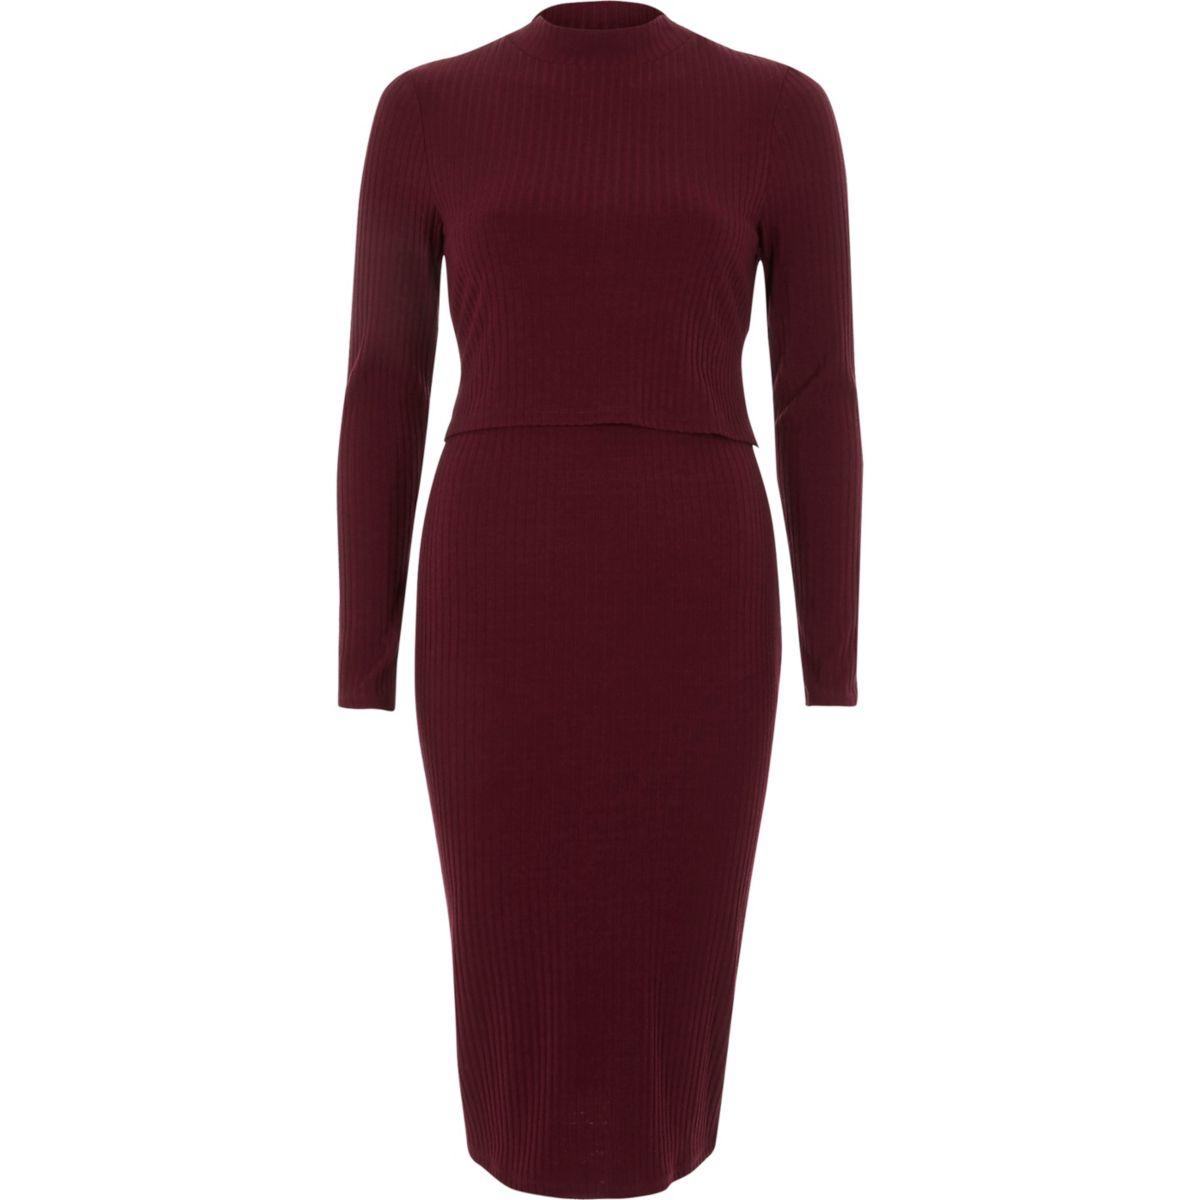 Dark red rib double layer bodycon midi dress